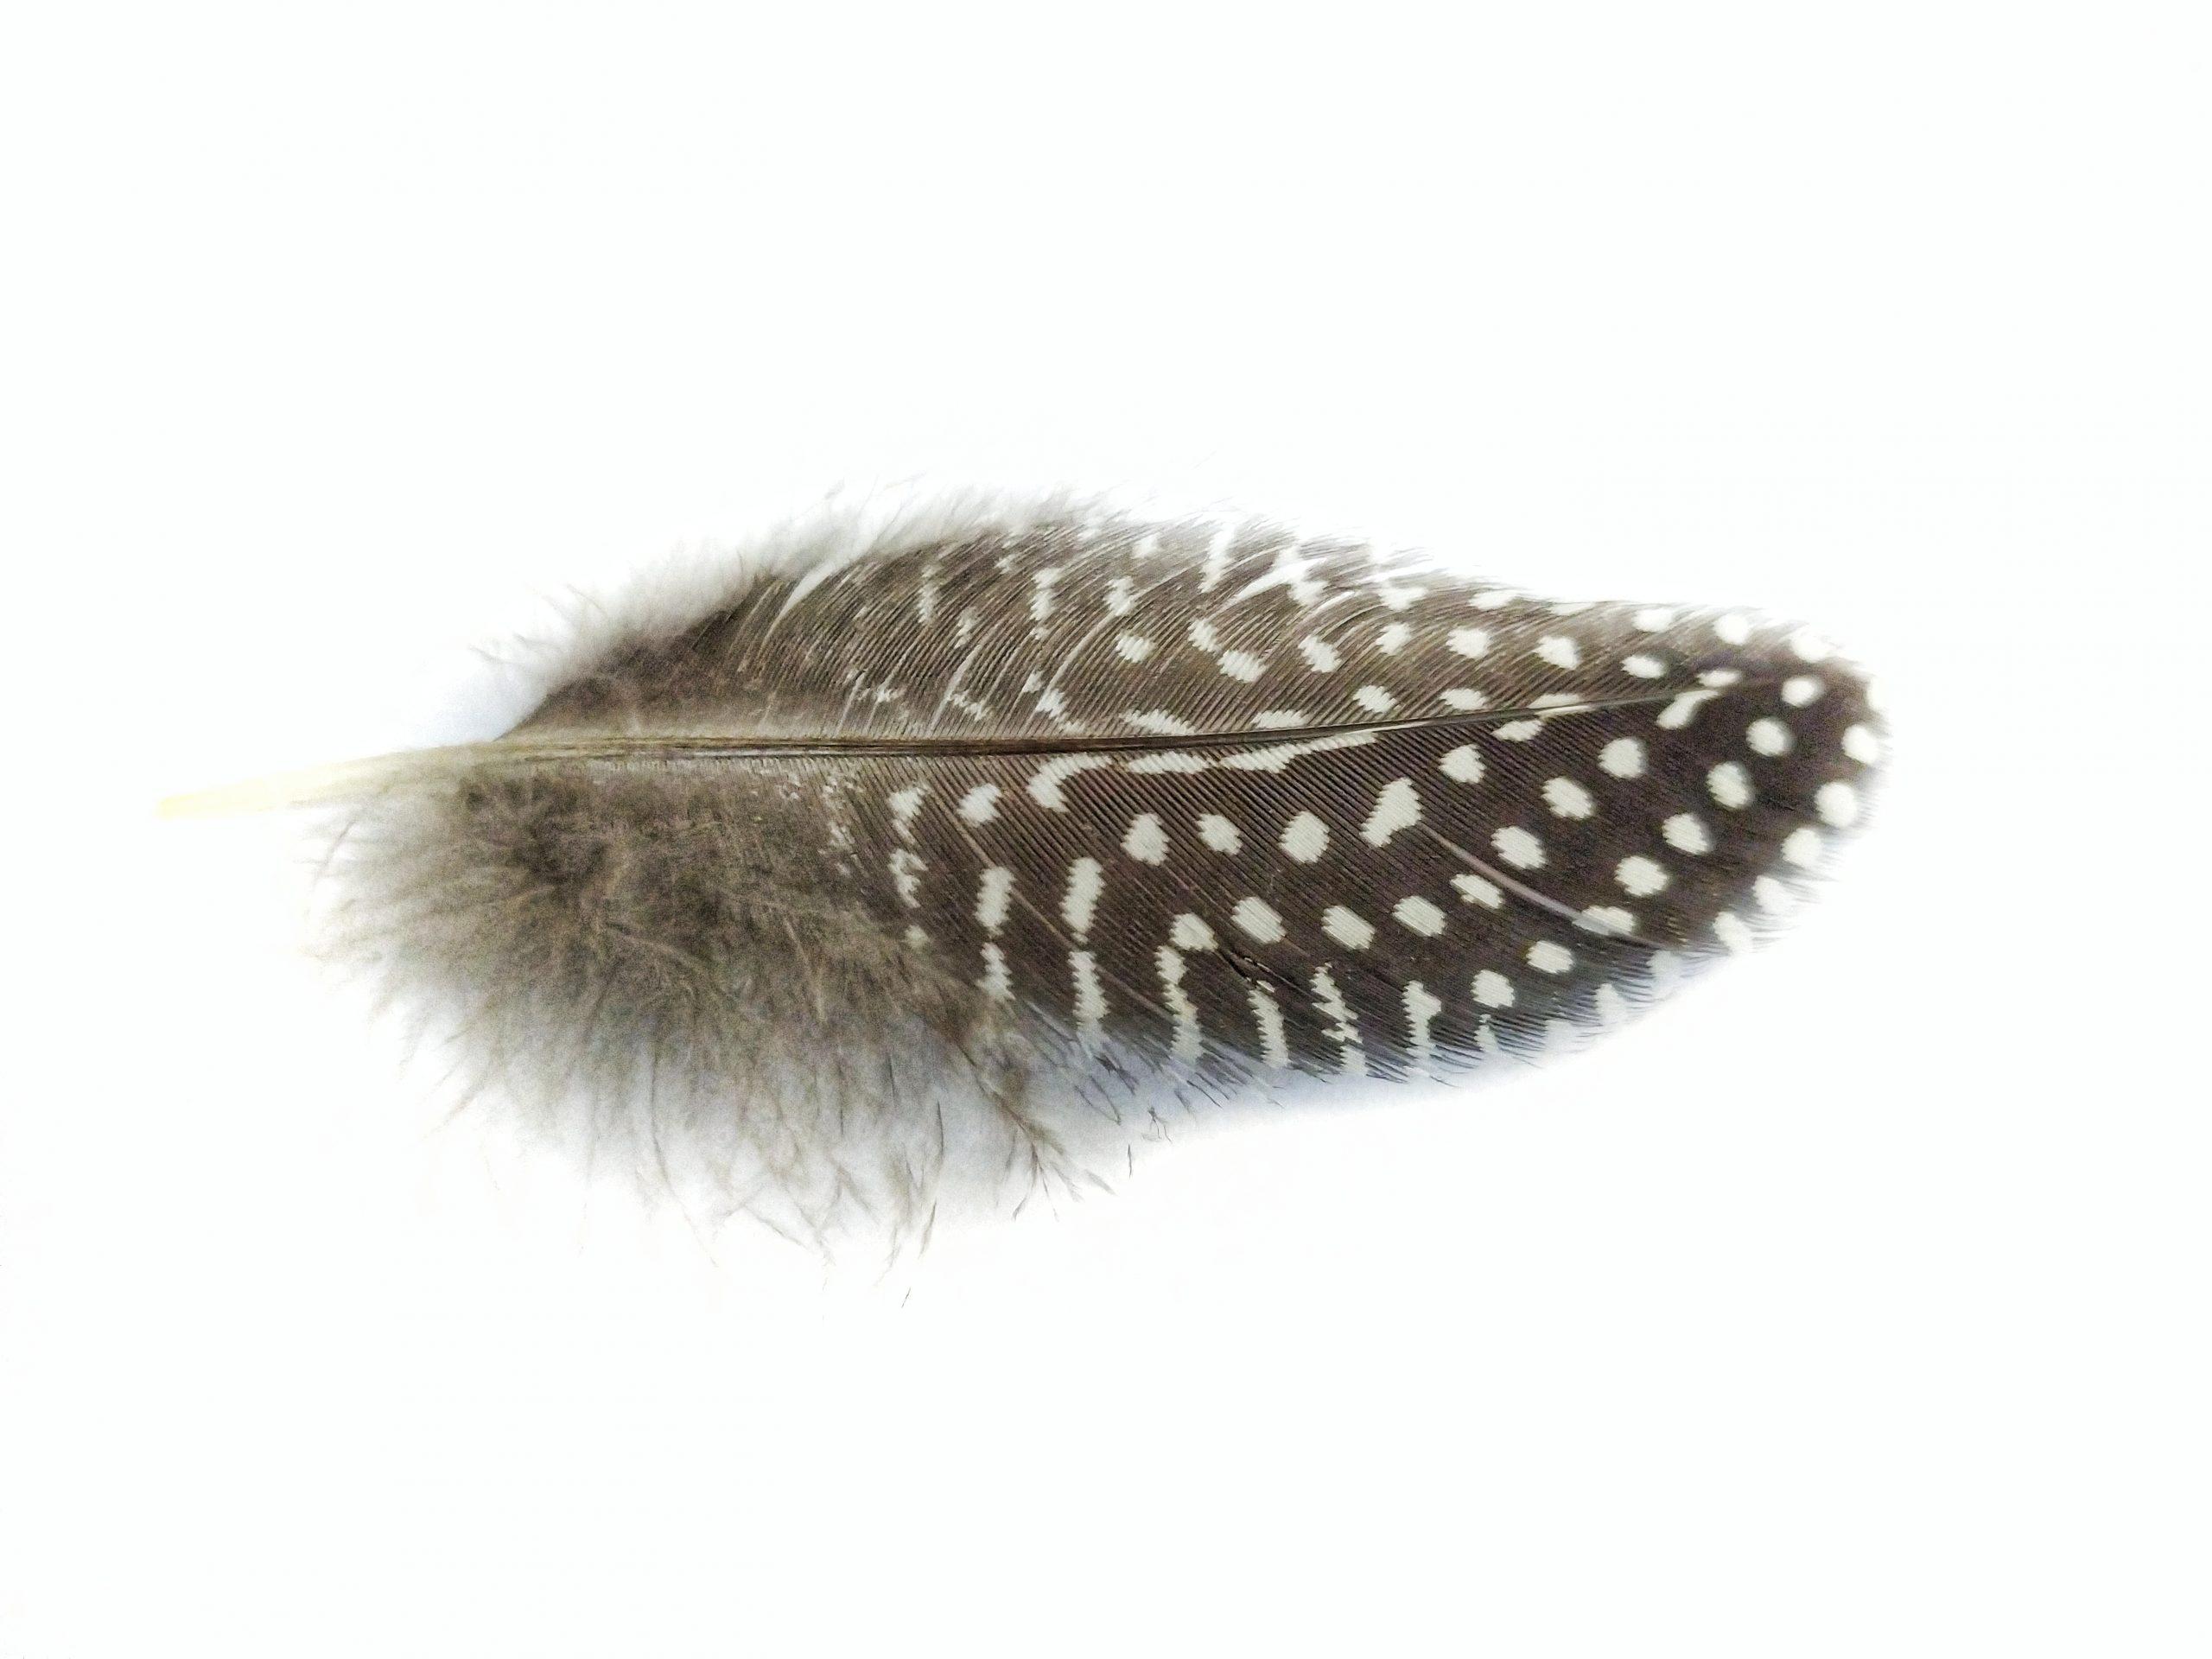 A wing of a bird